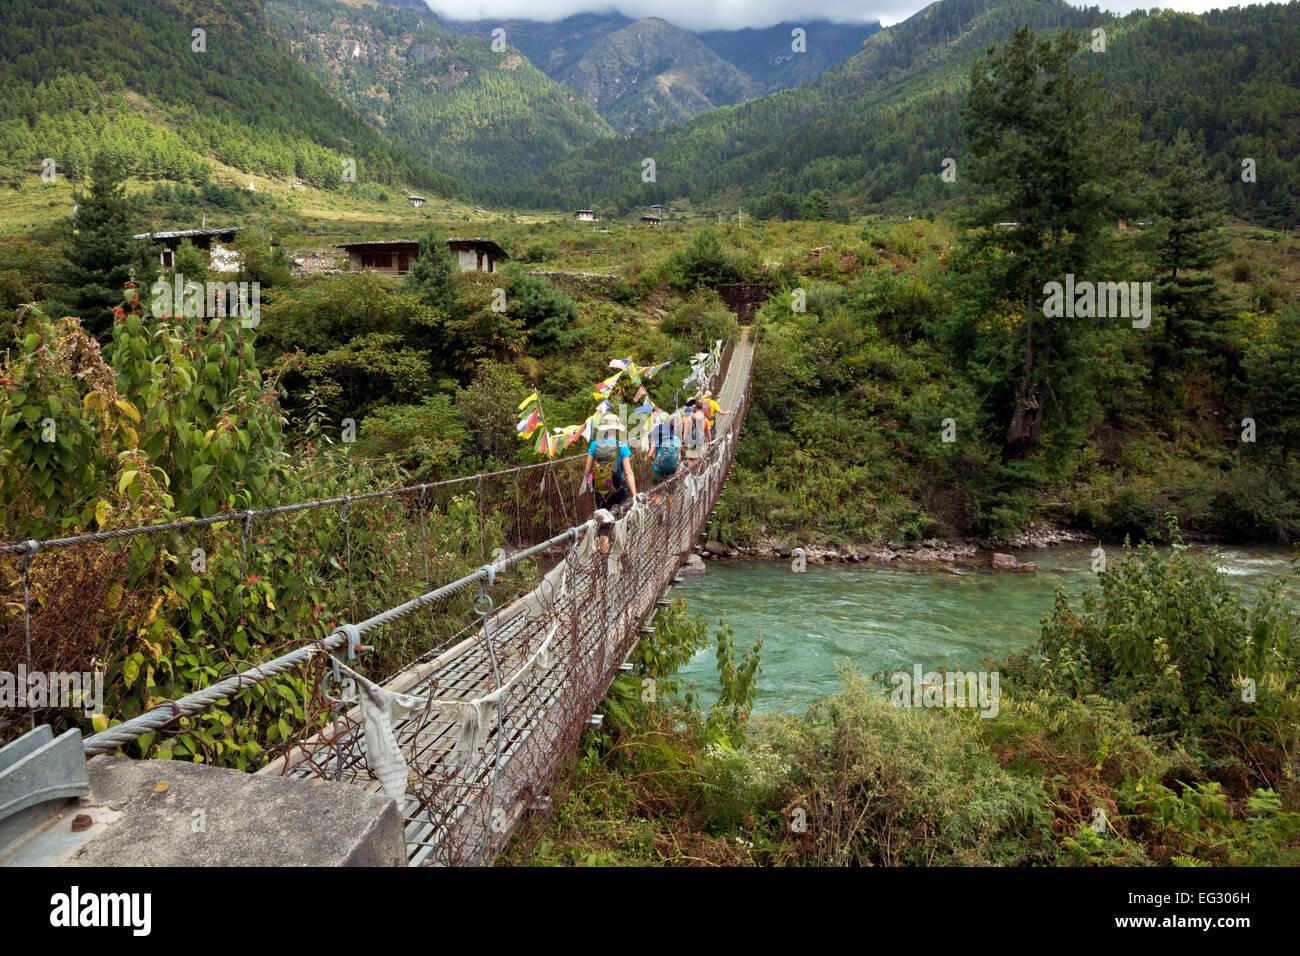 BU00143-00...BHUTAN - Trekkers crossing the Paro Chhu (river) on the first day of walking on the Jhomolhari 2 Trek. - Stock Image